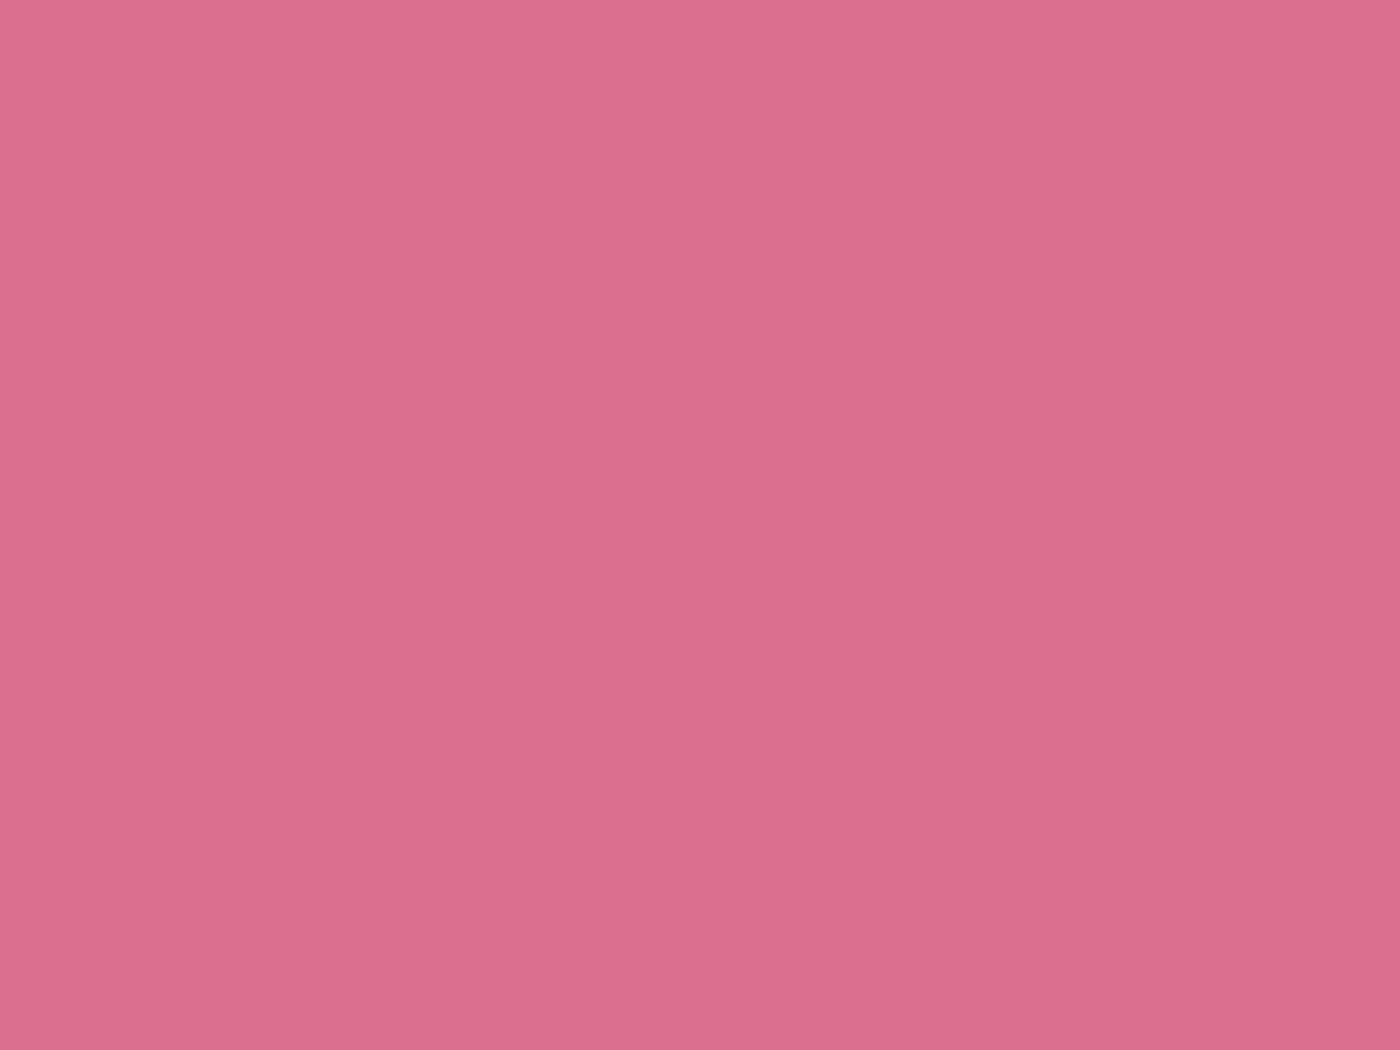 1400x1050 Pale Violet-red Solid Color Background